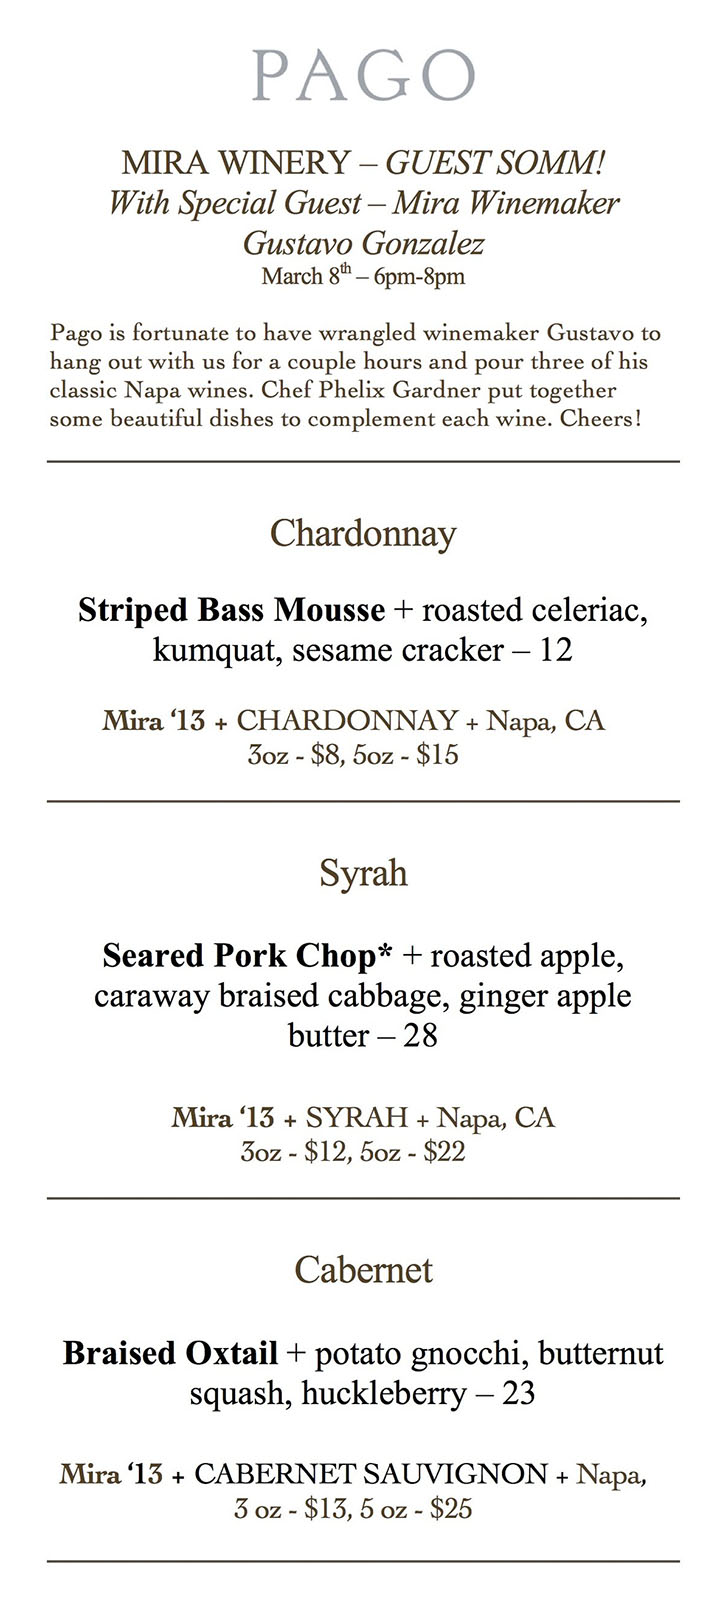 Pago - Mira Winery dinner menu